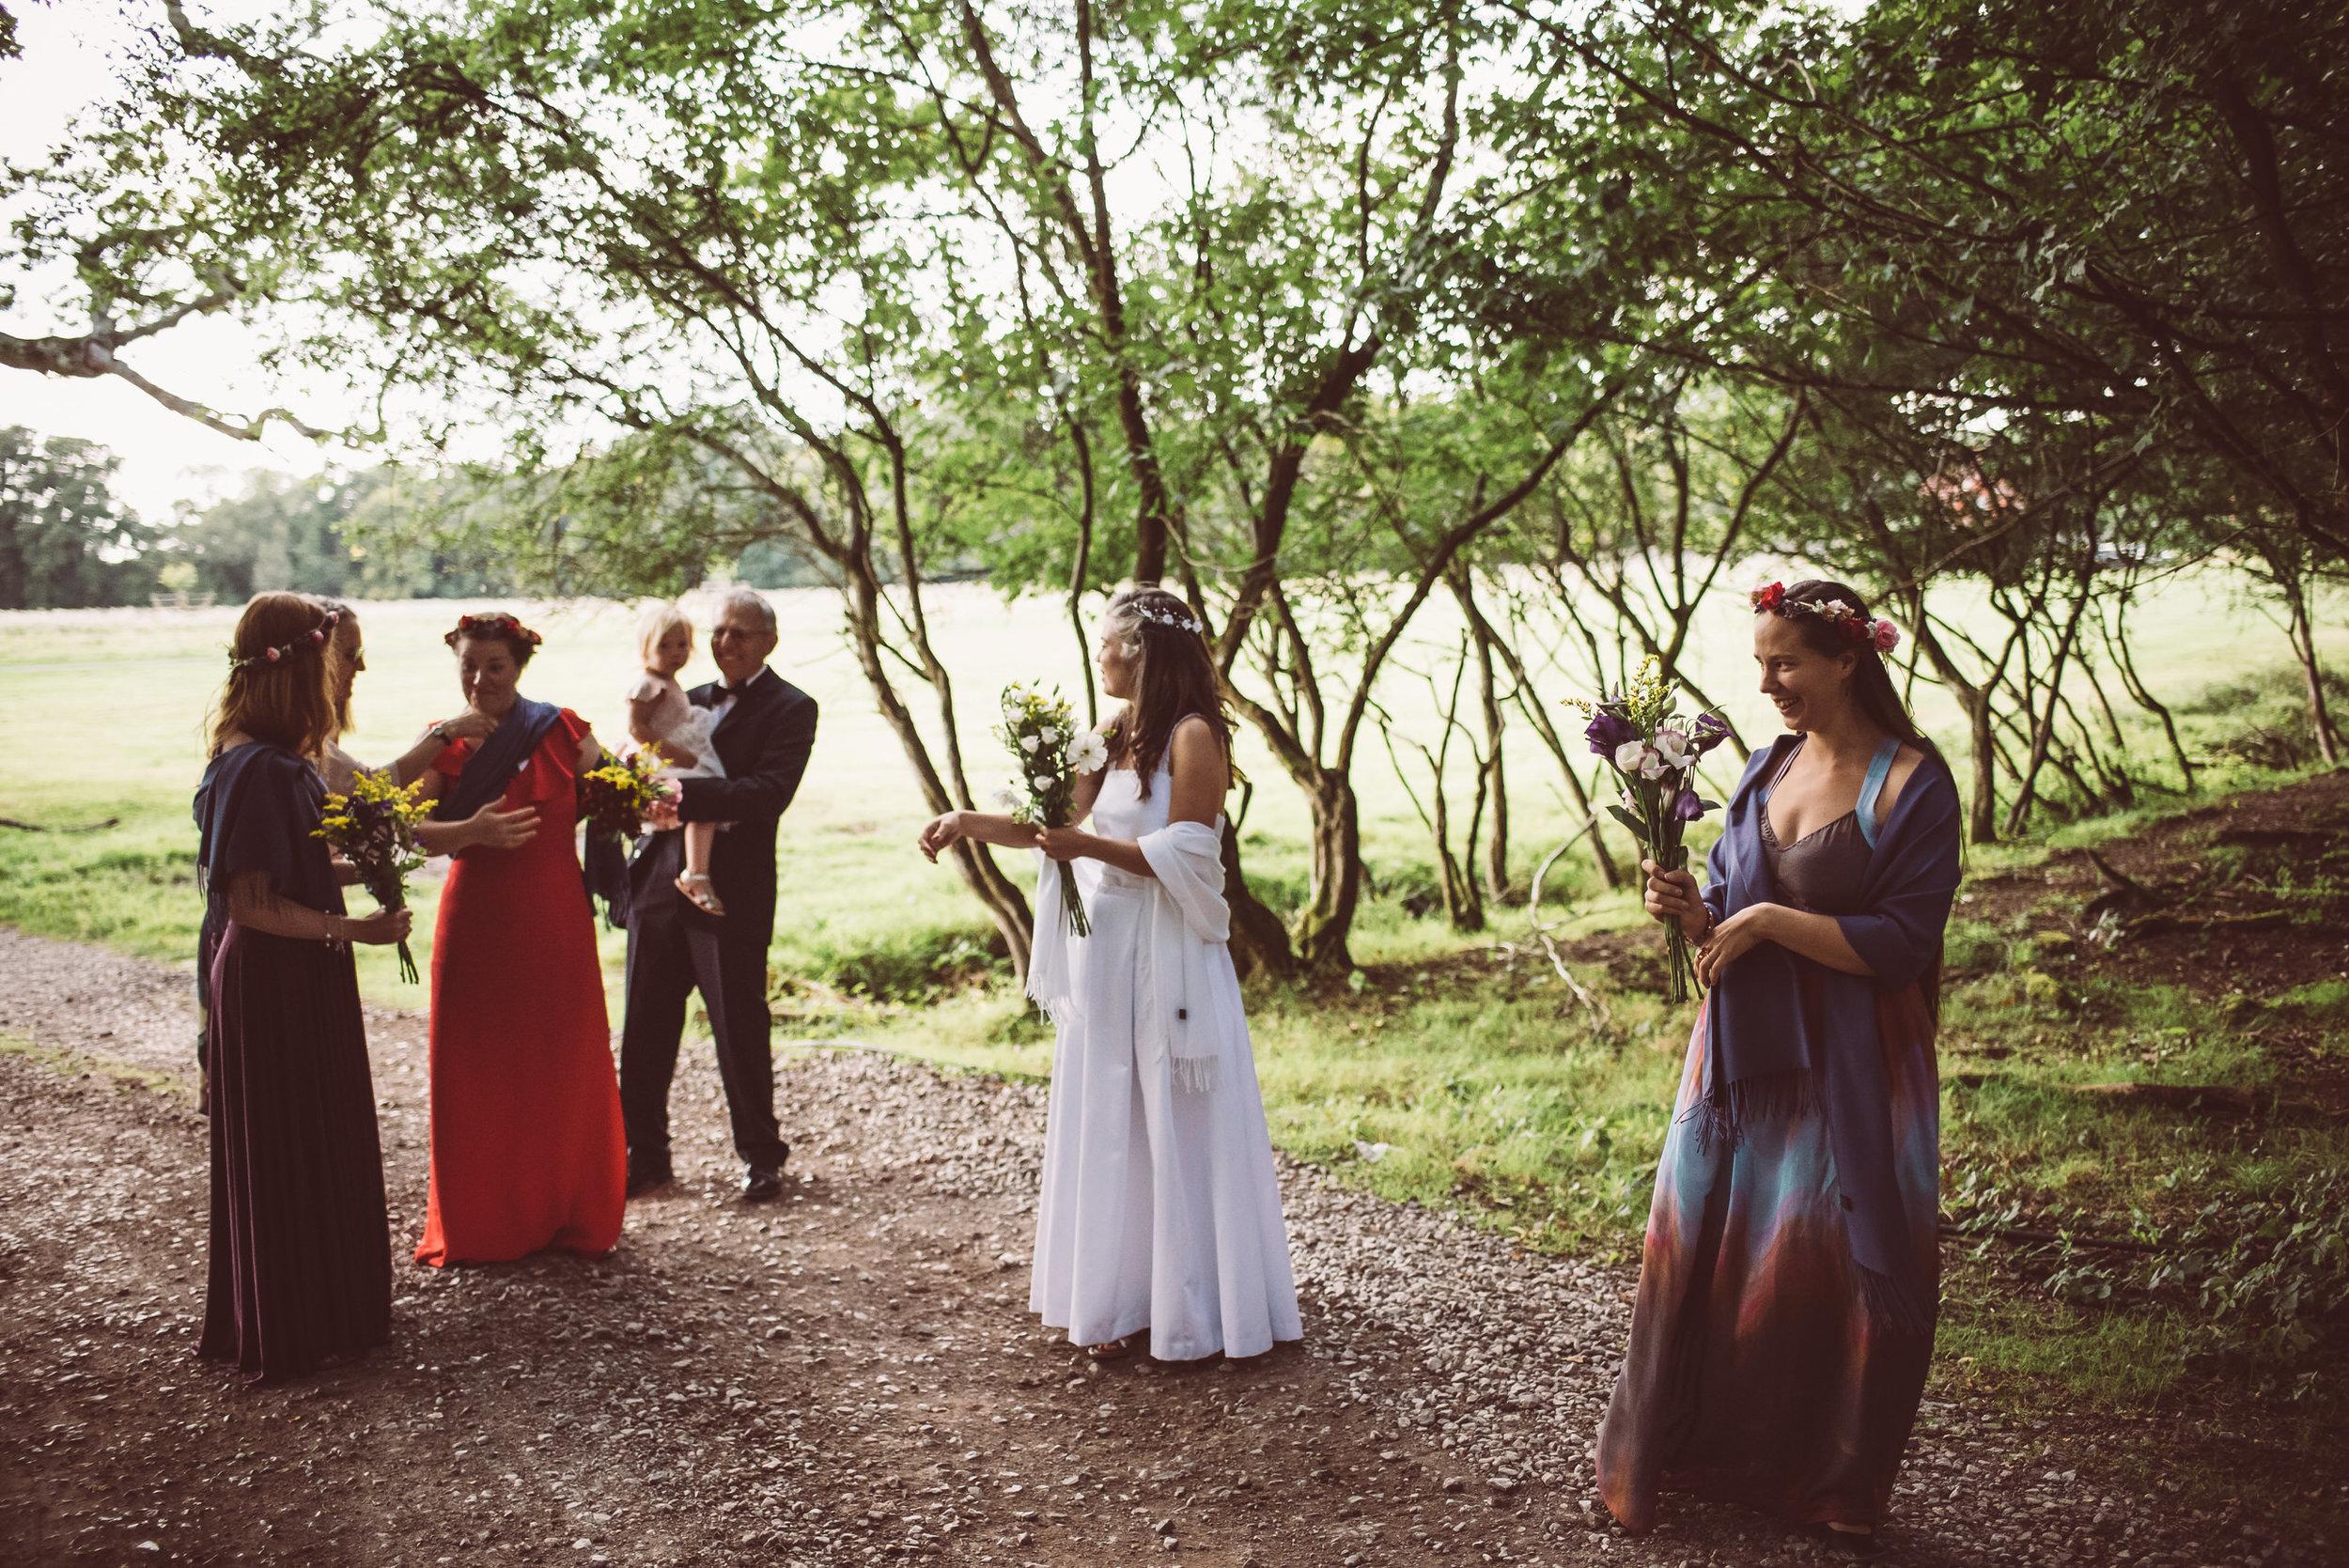 knepp-castle-boho-outdoor-wedding-123.jpg